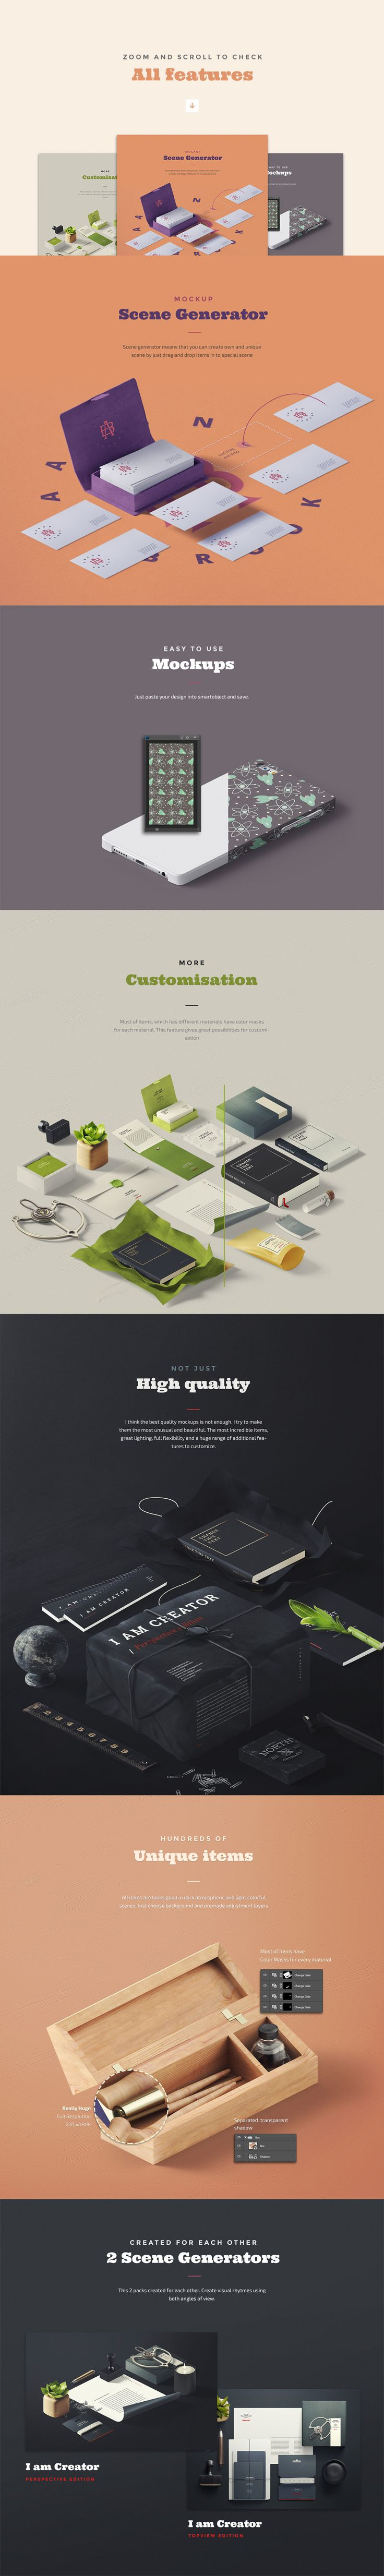 I Am Creator [Perspective Edition] #design Download: https://creativemarket.com/ruslan_latypov/302545-I-Am-Creator-Perspective-Edition?u=ksioks